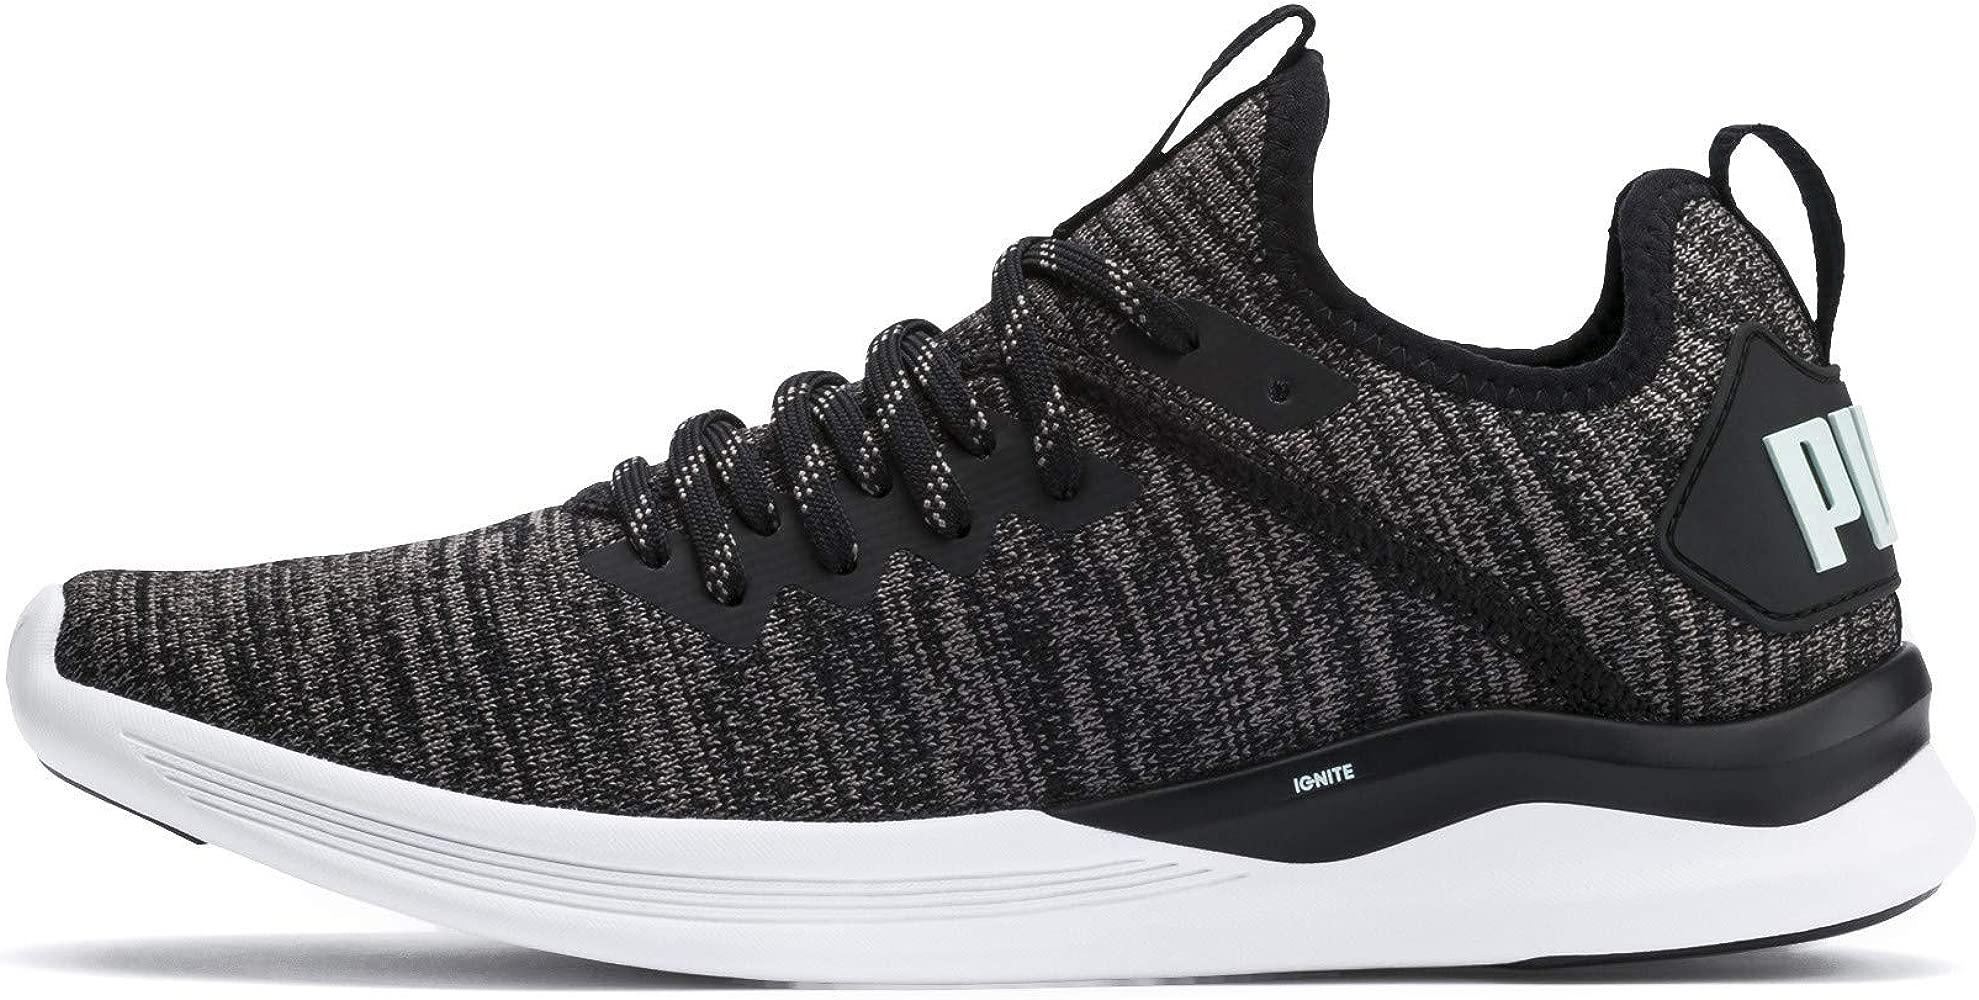 Puma Athletic Shoes Mens Ignite Flash evoKNIT Black Lightweight Training Sneaker